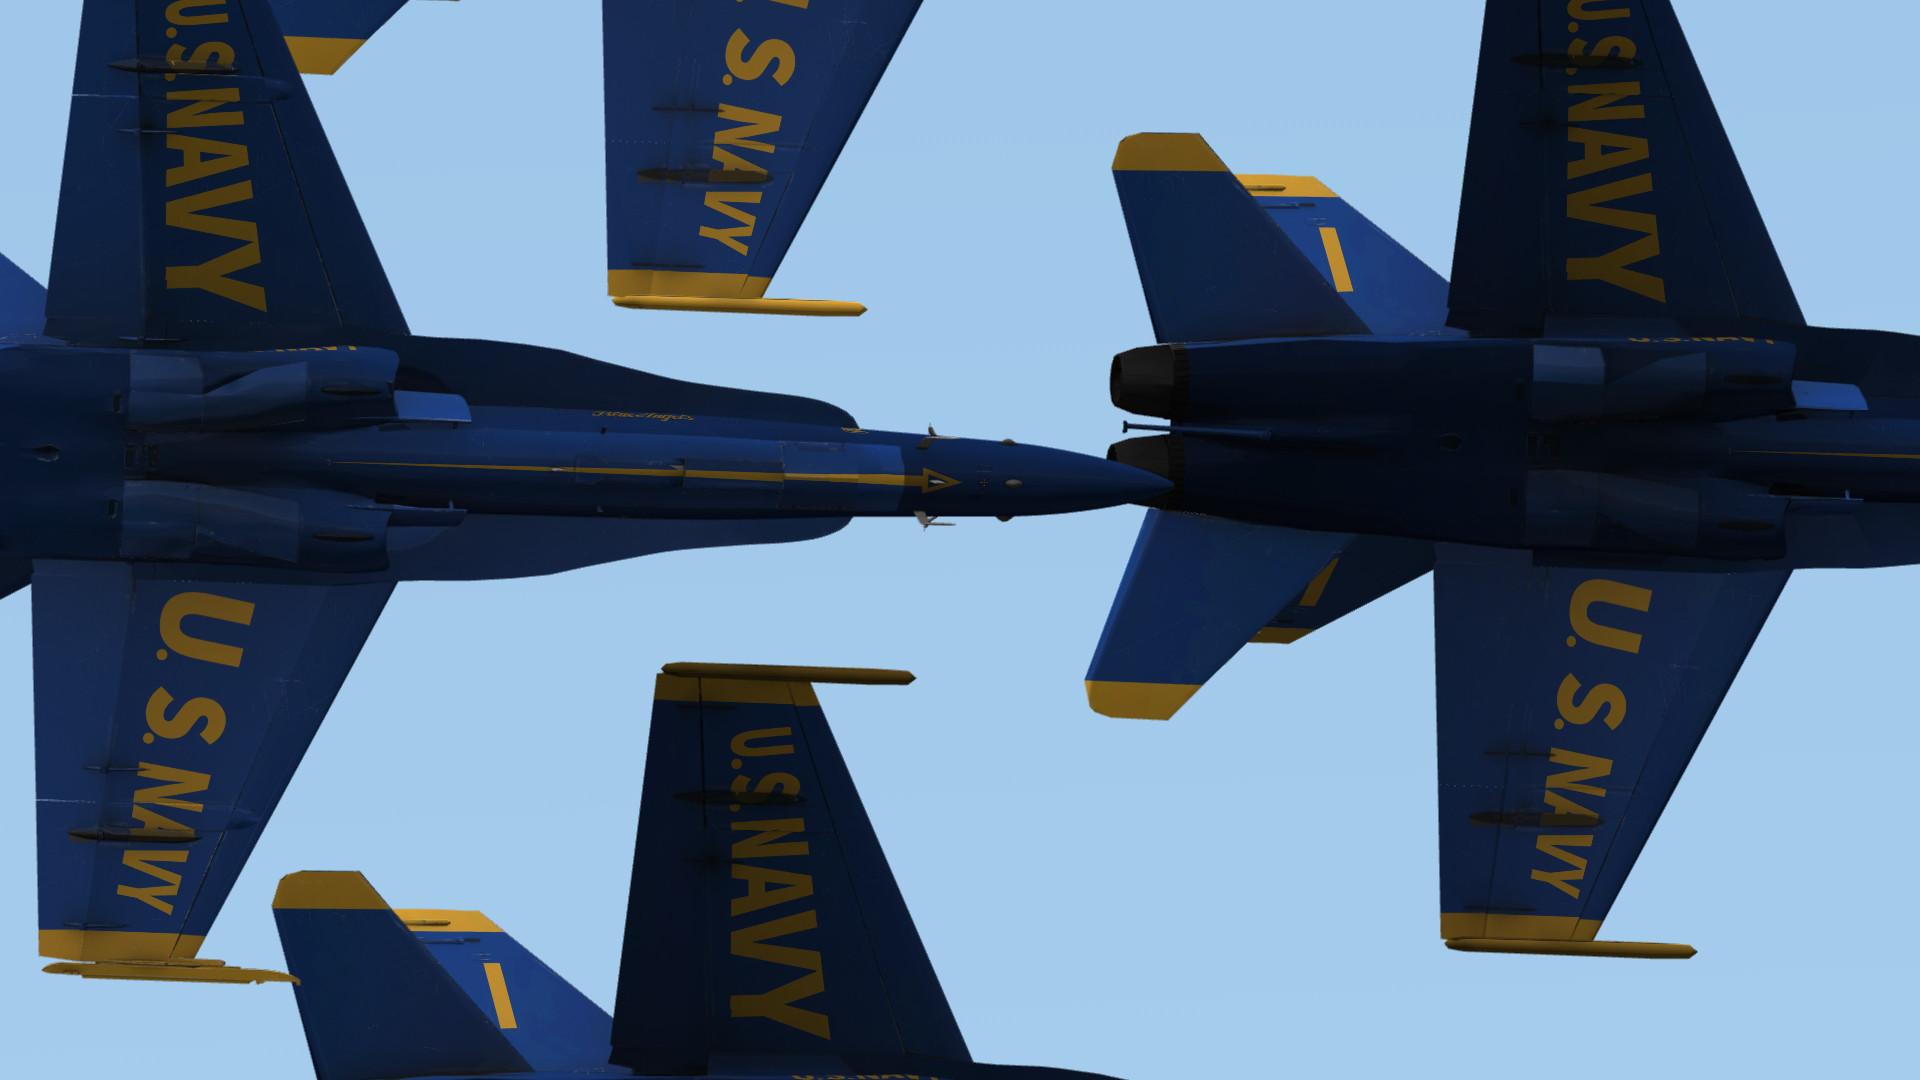 Обои Blue angels, Speed, wallpapers, navy. Авиация foto 18